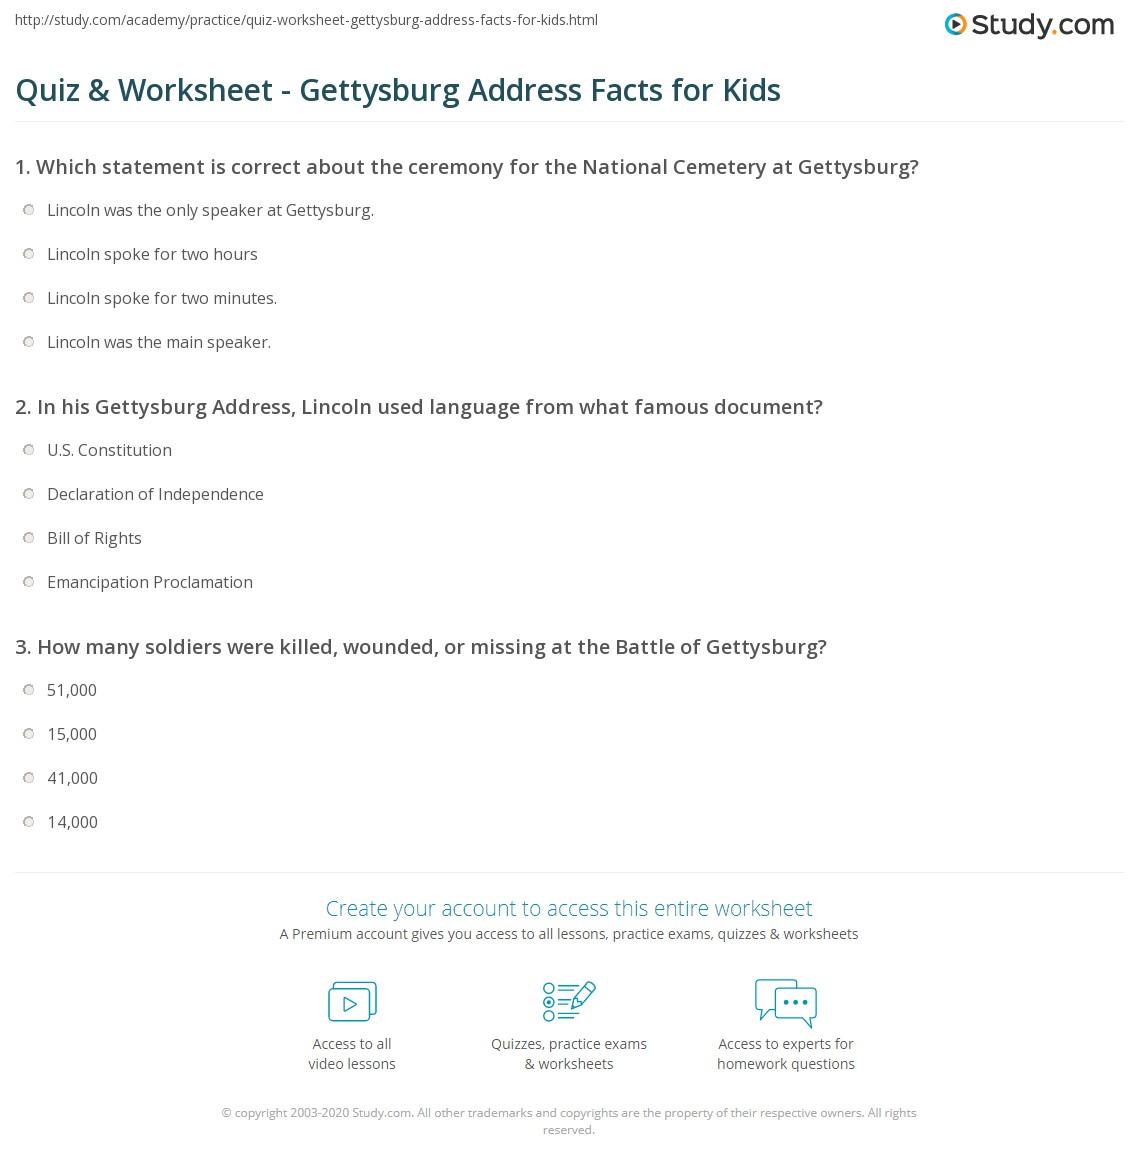 Quiz Worksheet Gettysburg Address Facts For Kids on Emancipation Proclamation Worksheet